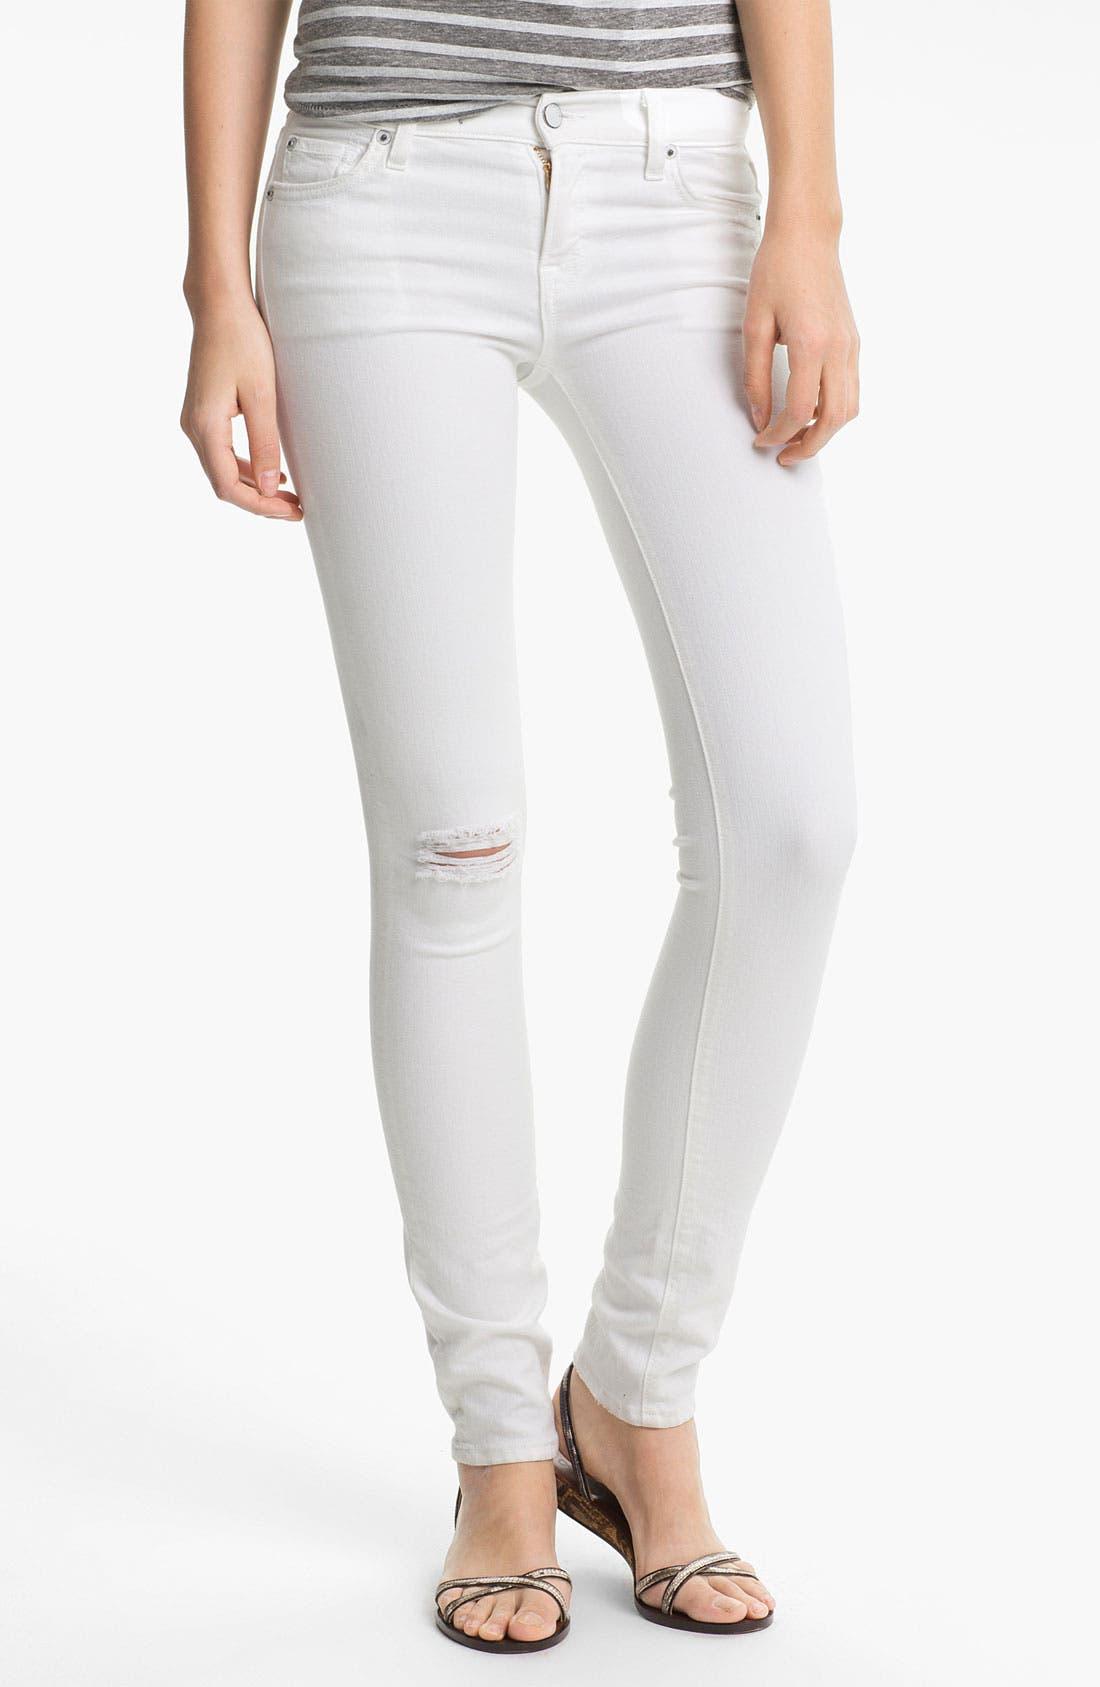 Alternate Image 1 Selected - TEXTILE Elizabeth and James 'Debbie' Skinny Stretch Jeans